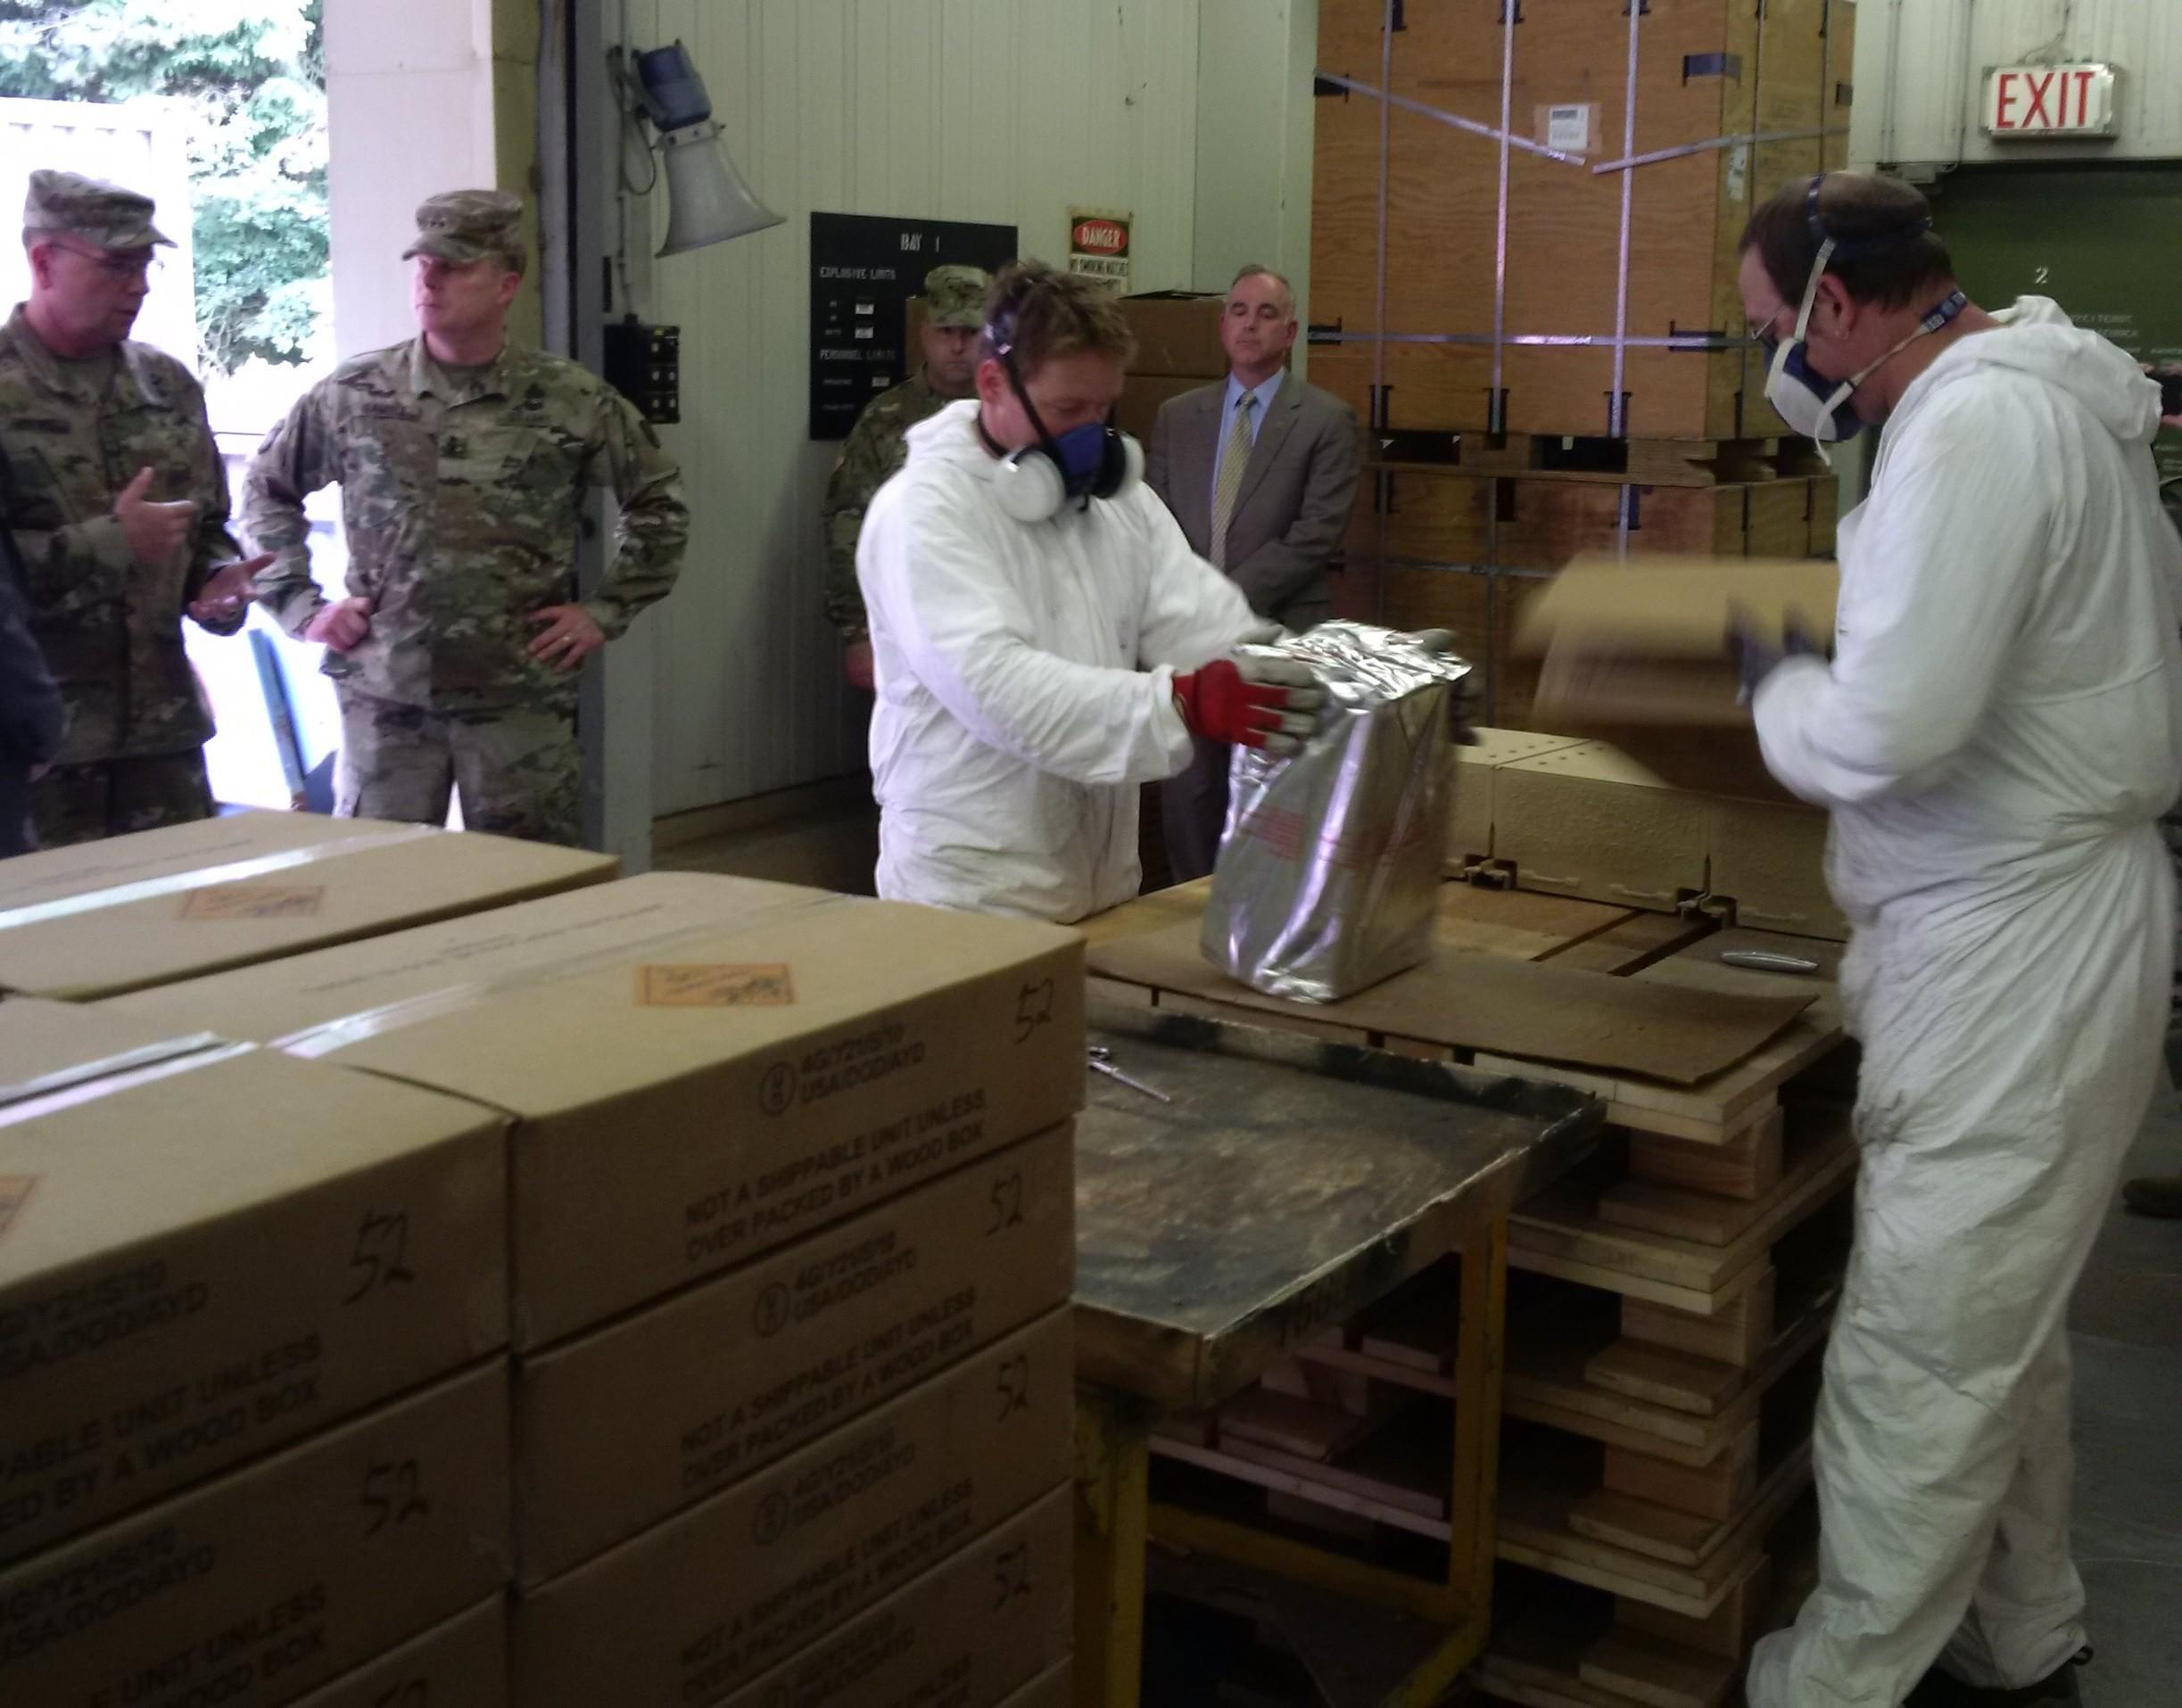 https://www.army.mil/e2/c/images/2016/07/12/442742/original.jpg